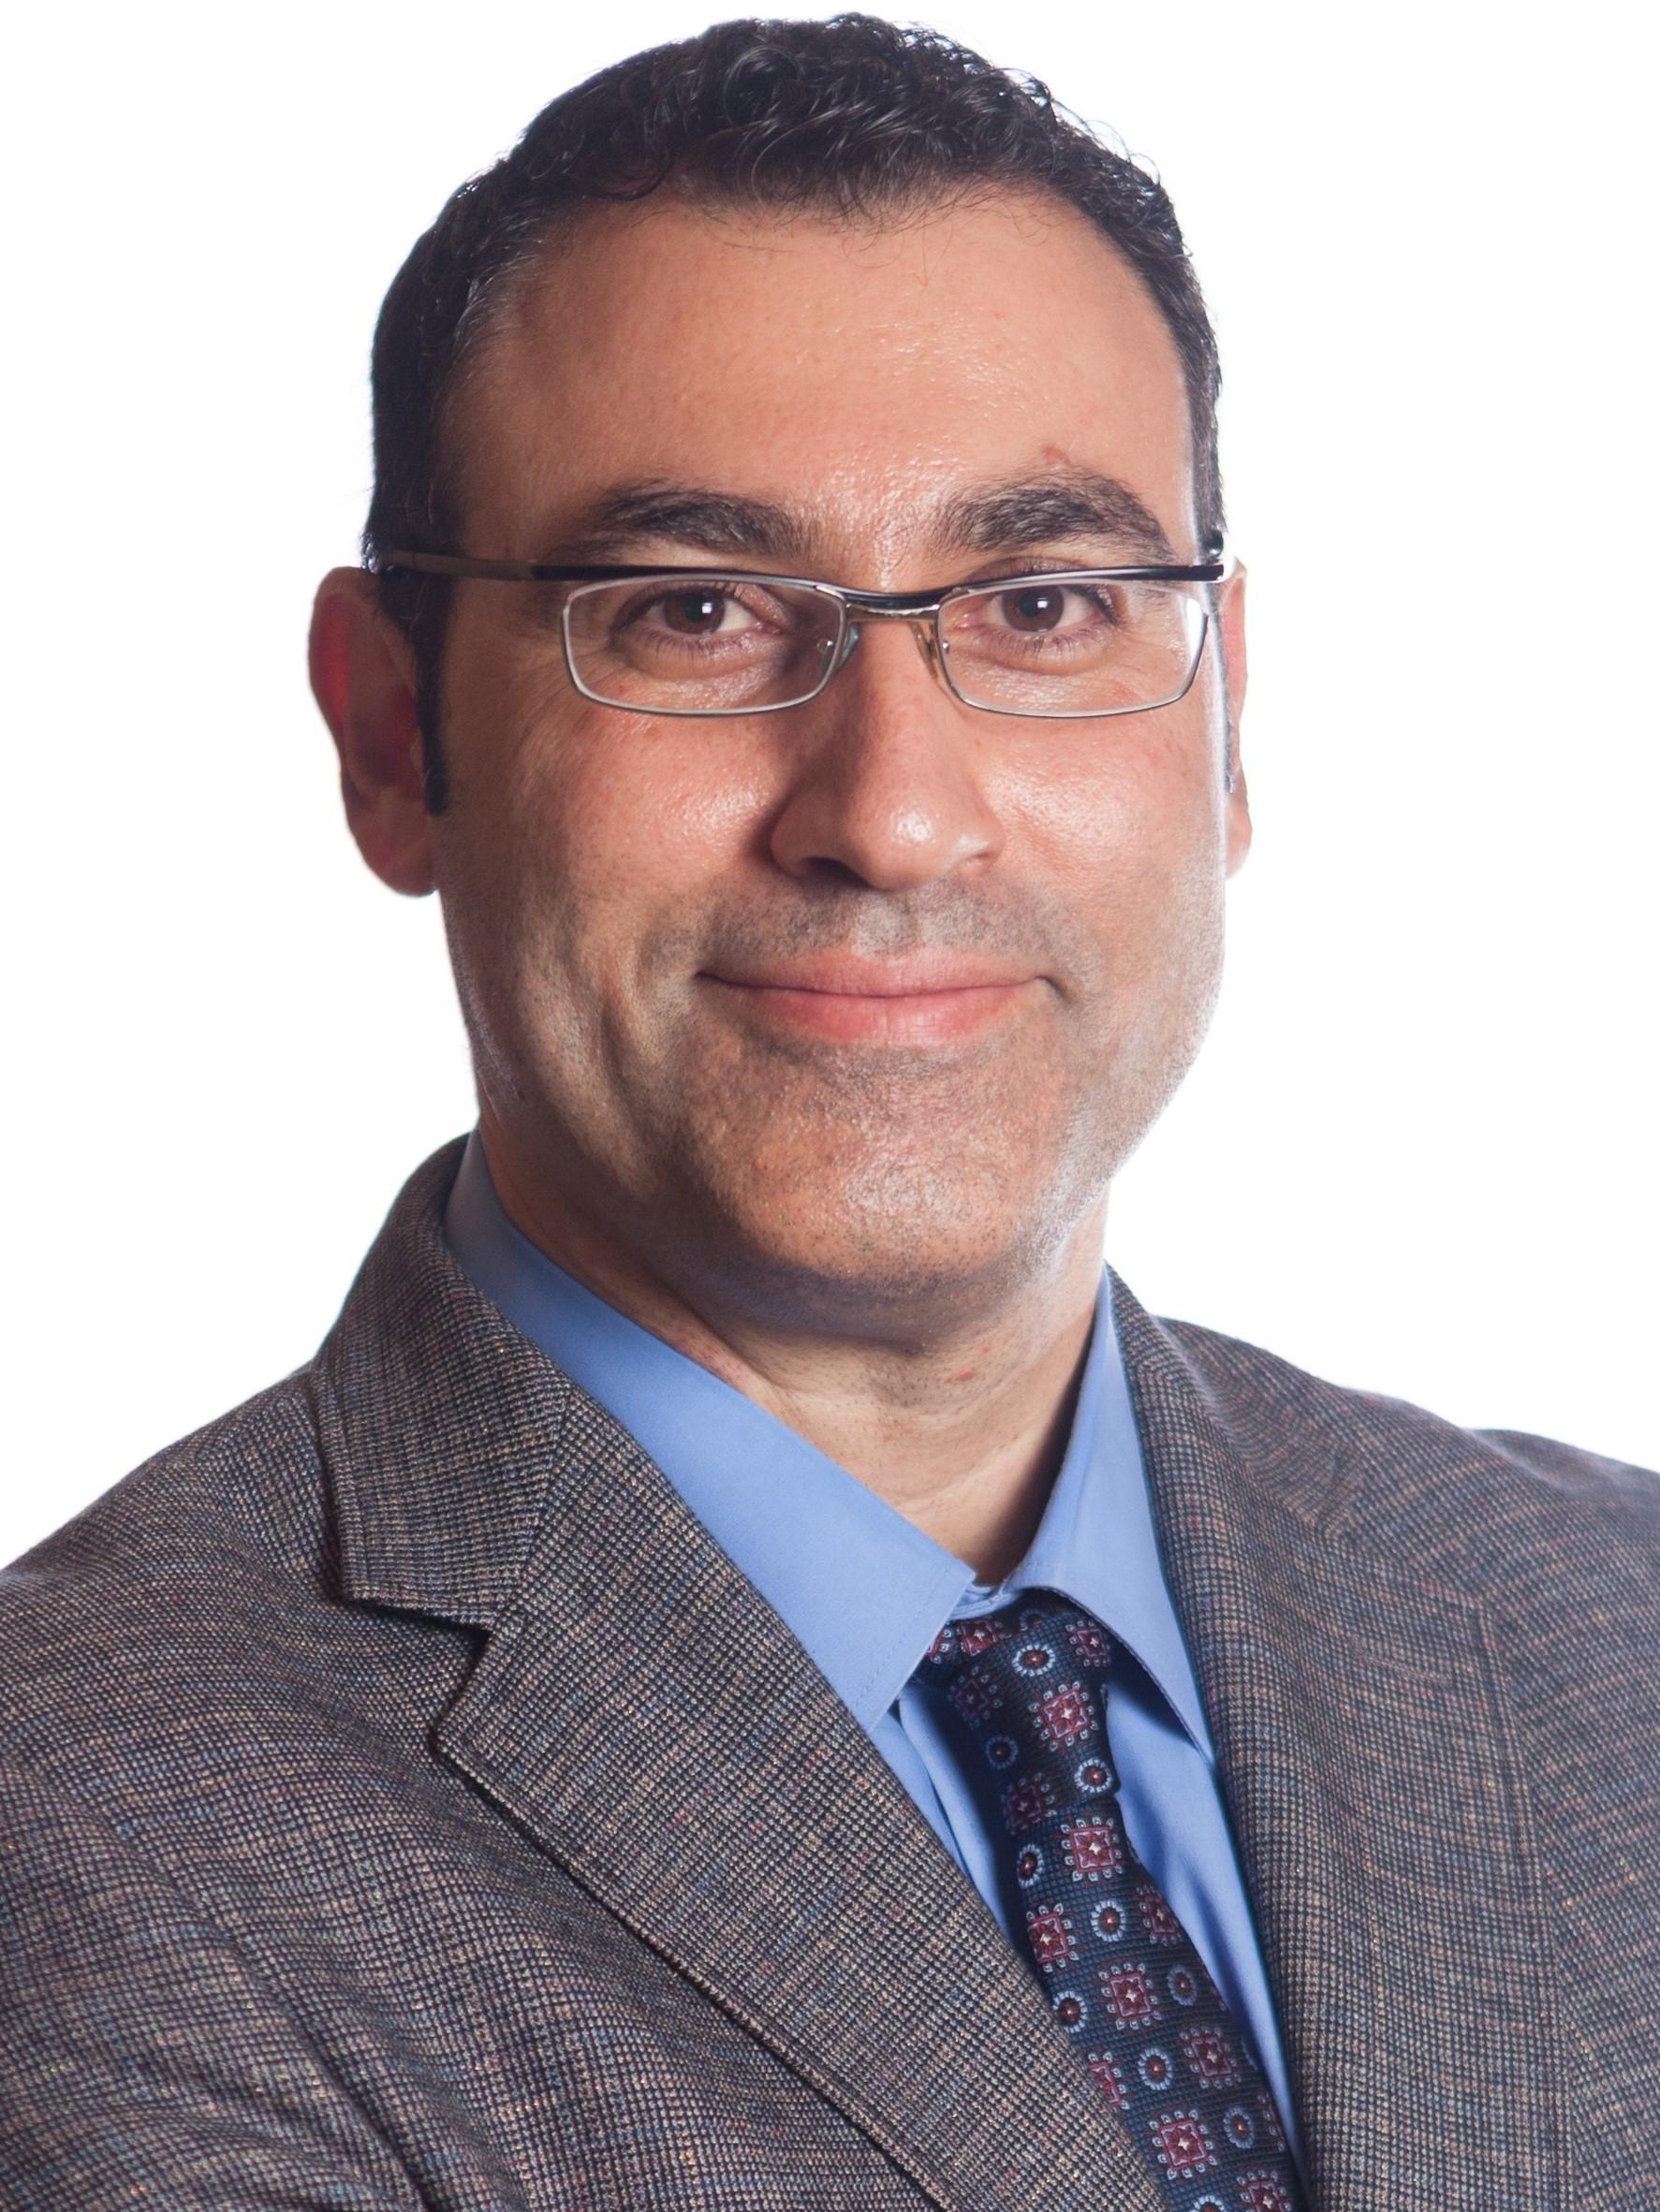 Omar Al-Farisi, SPWLA